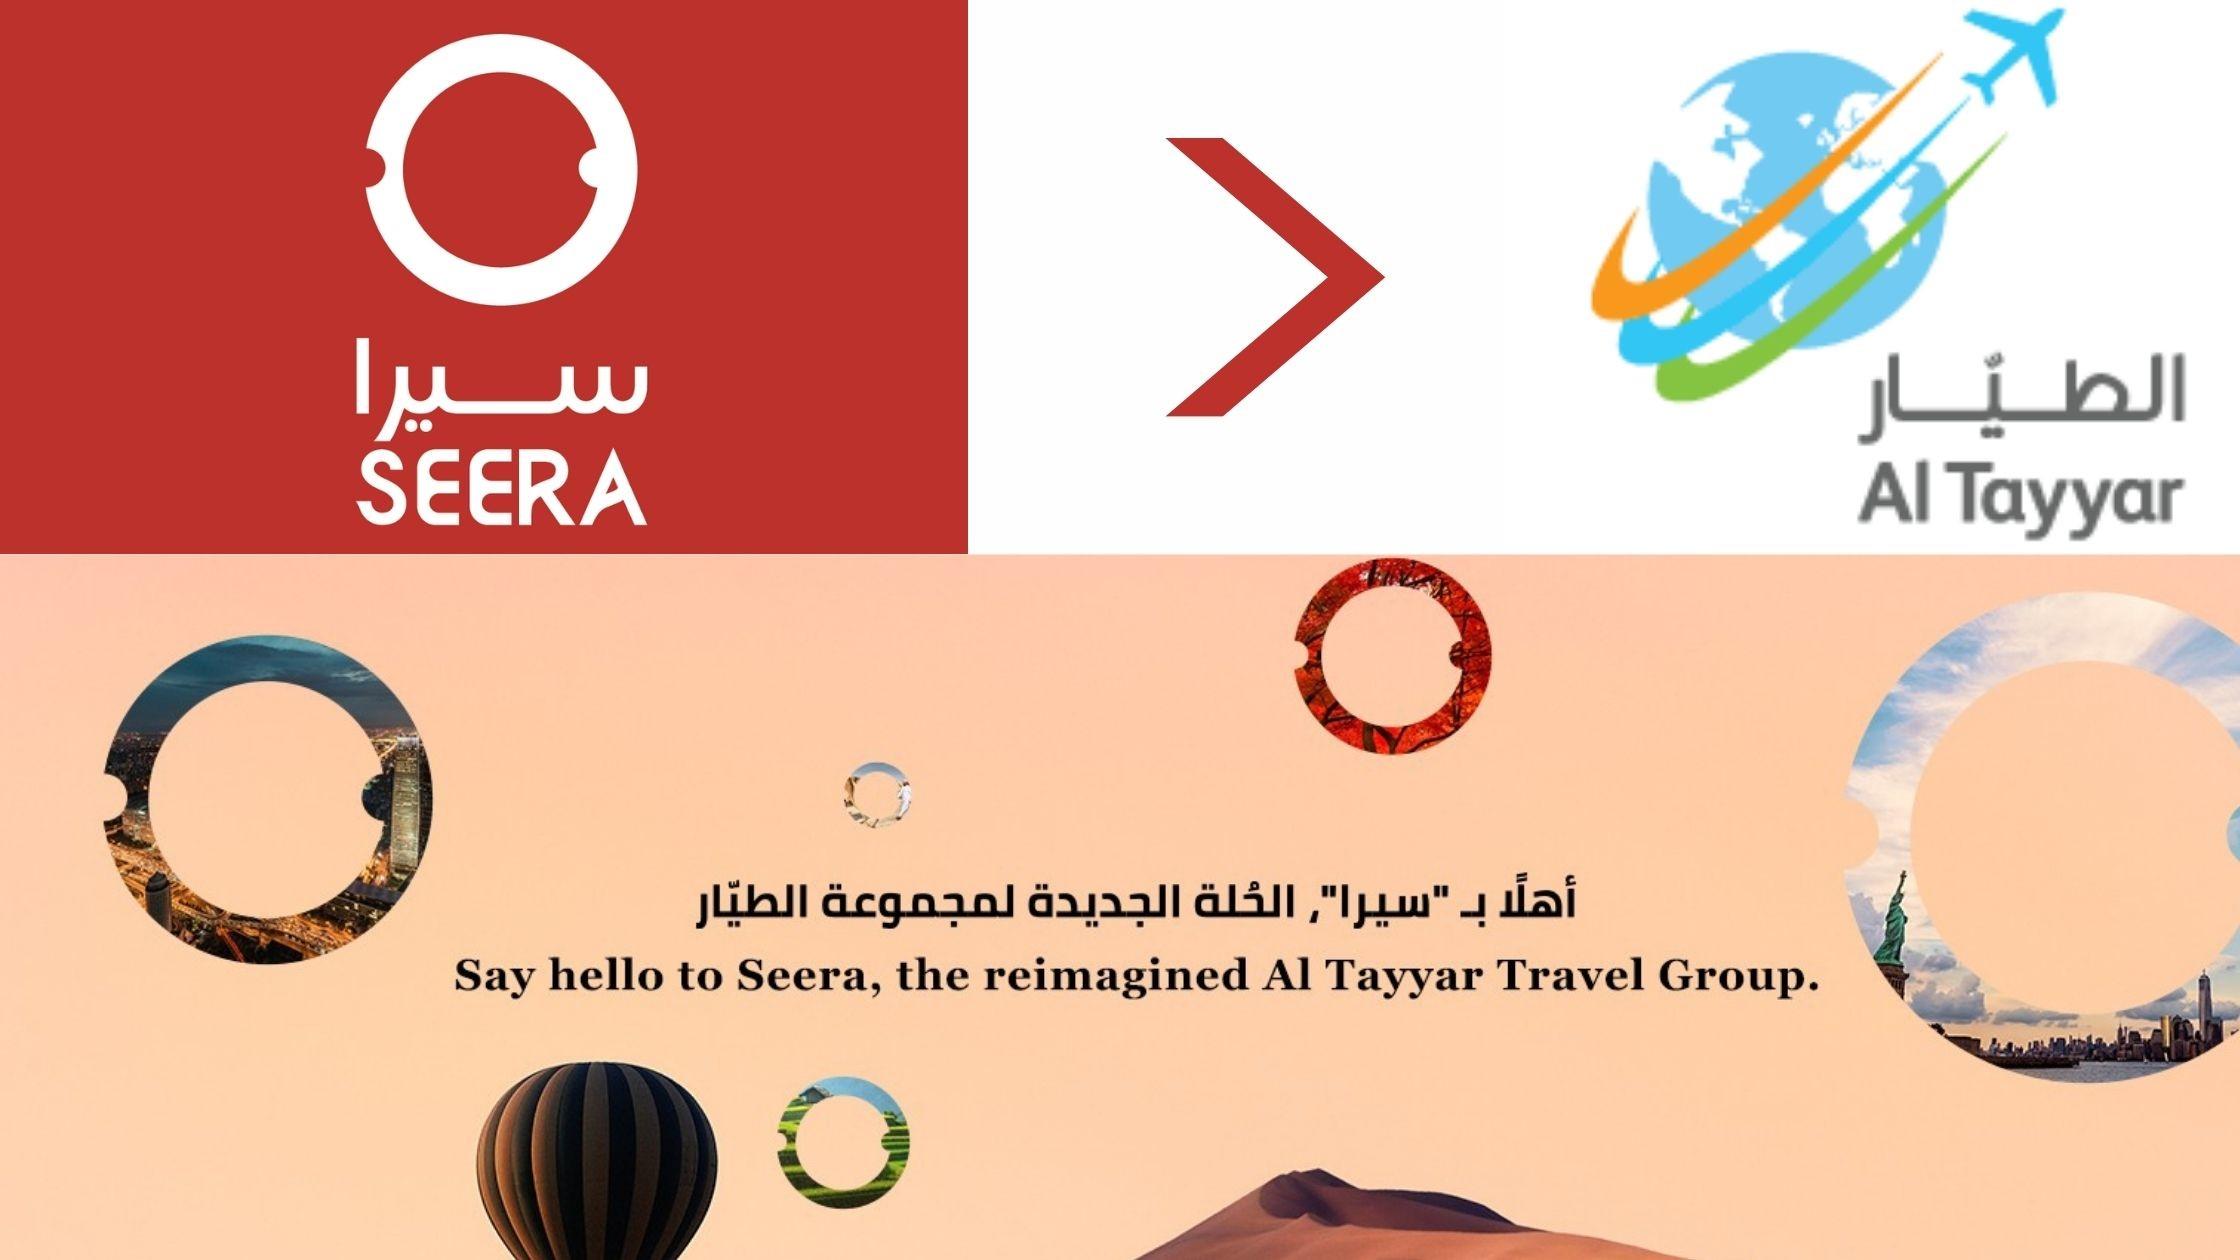 Al-Tayyar-Travel-Group-To-Seera